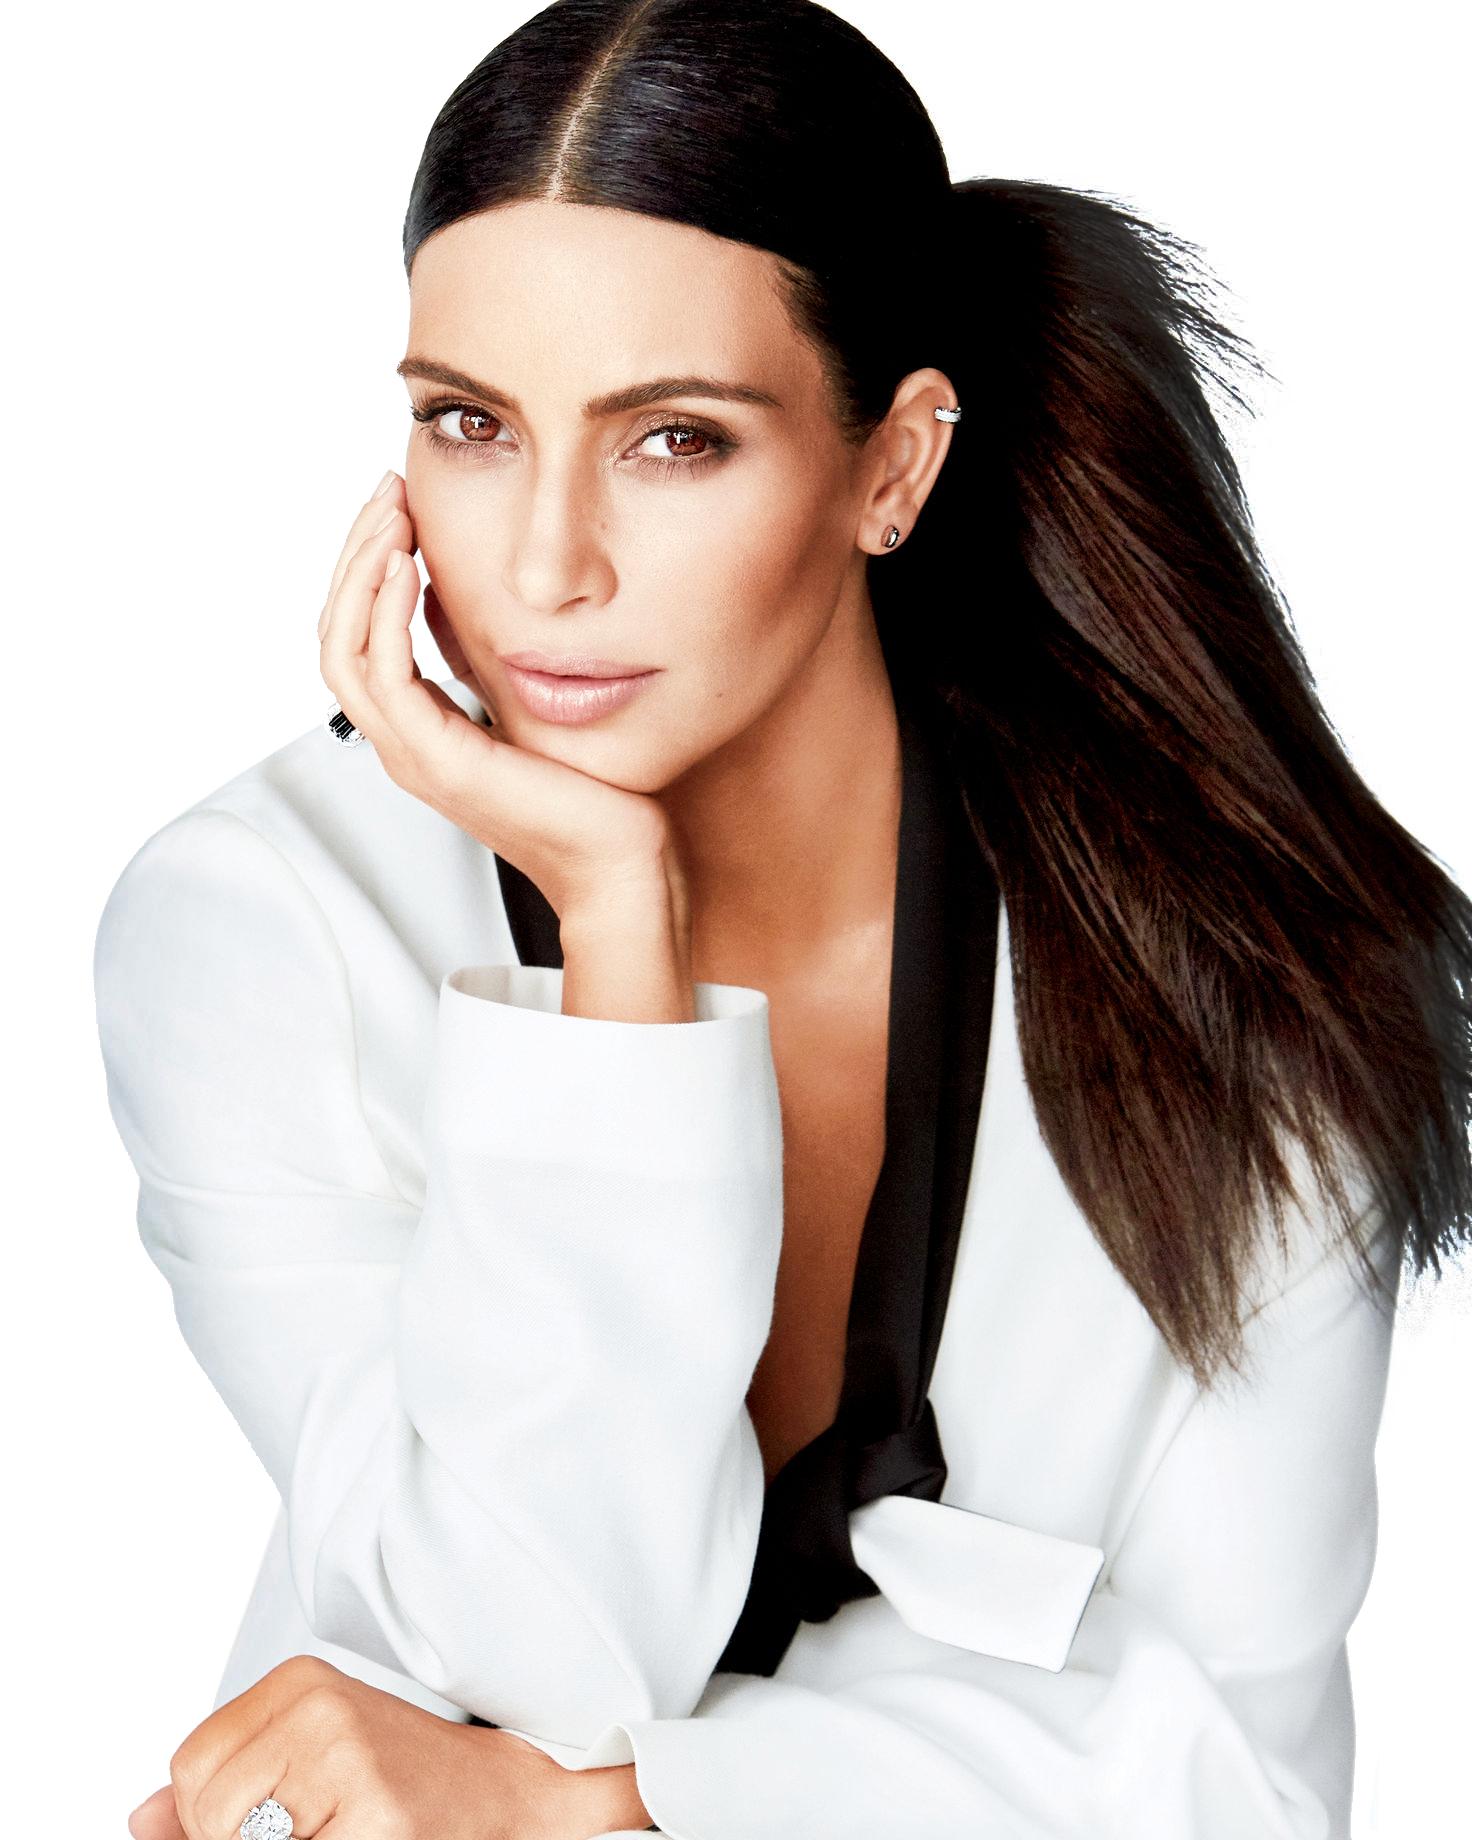 Kim Kardashian Transparent PNG Image-Kim Kardashian Transparent PNG Image-18